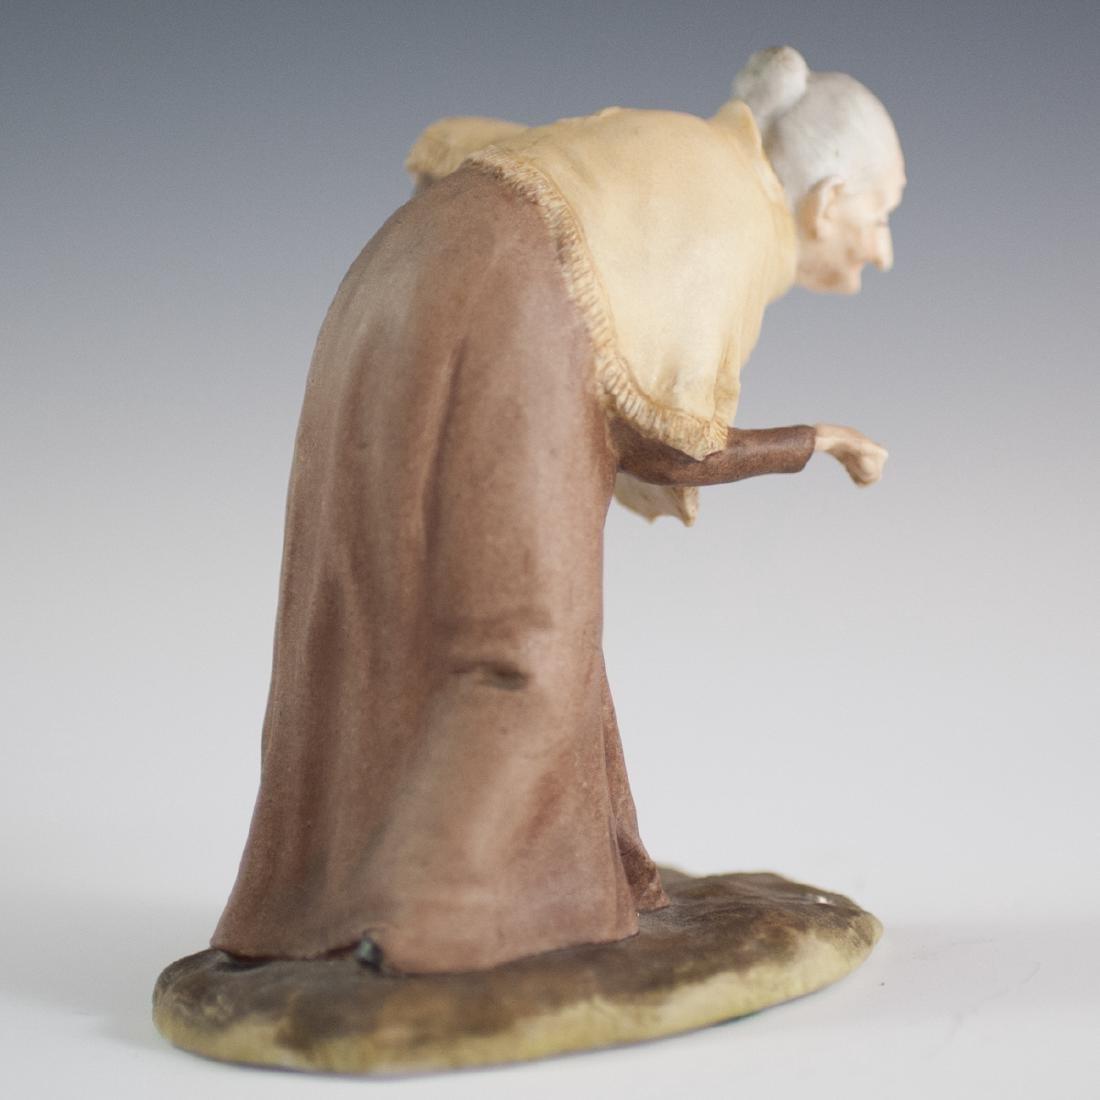 German Bisque Porcelain Figurine - 4